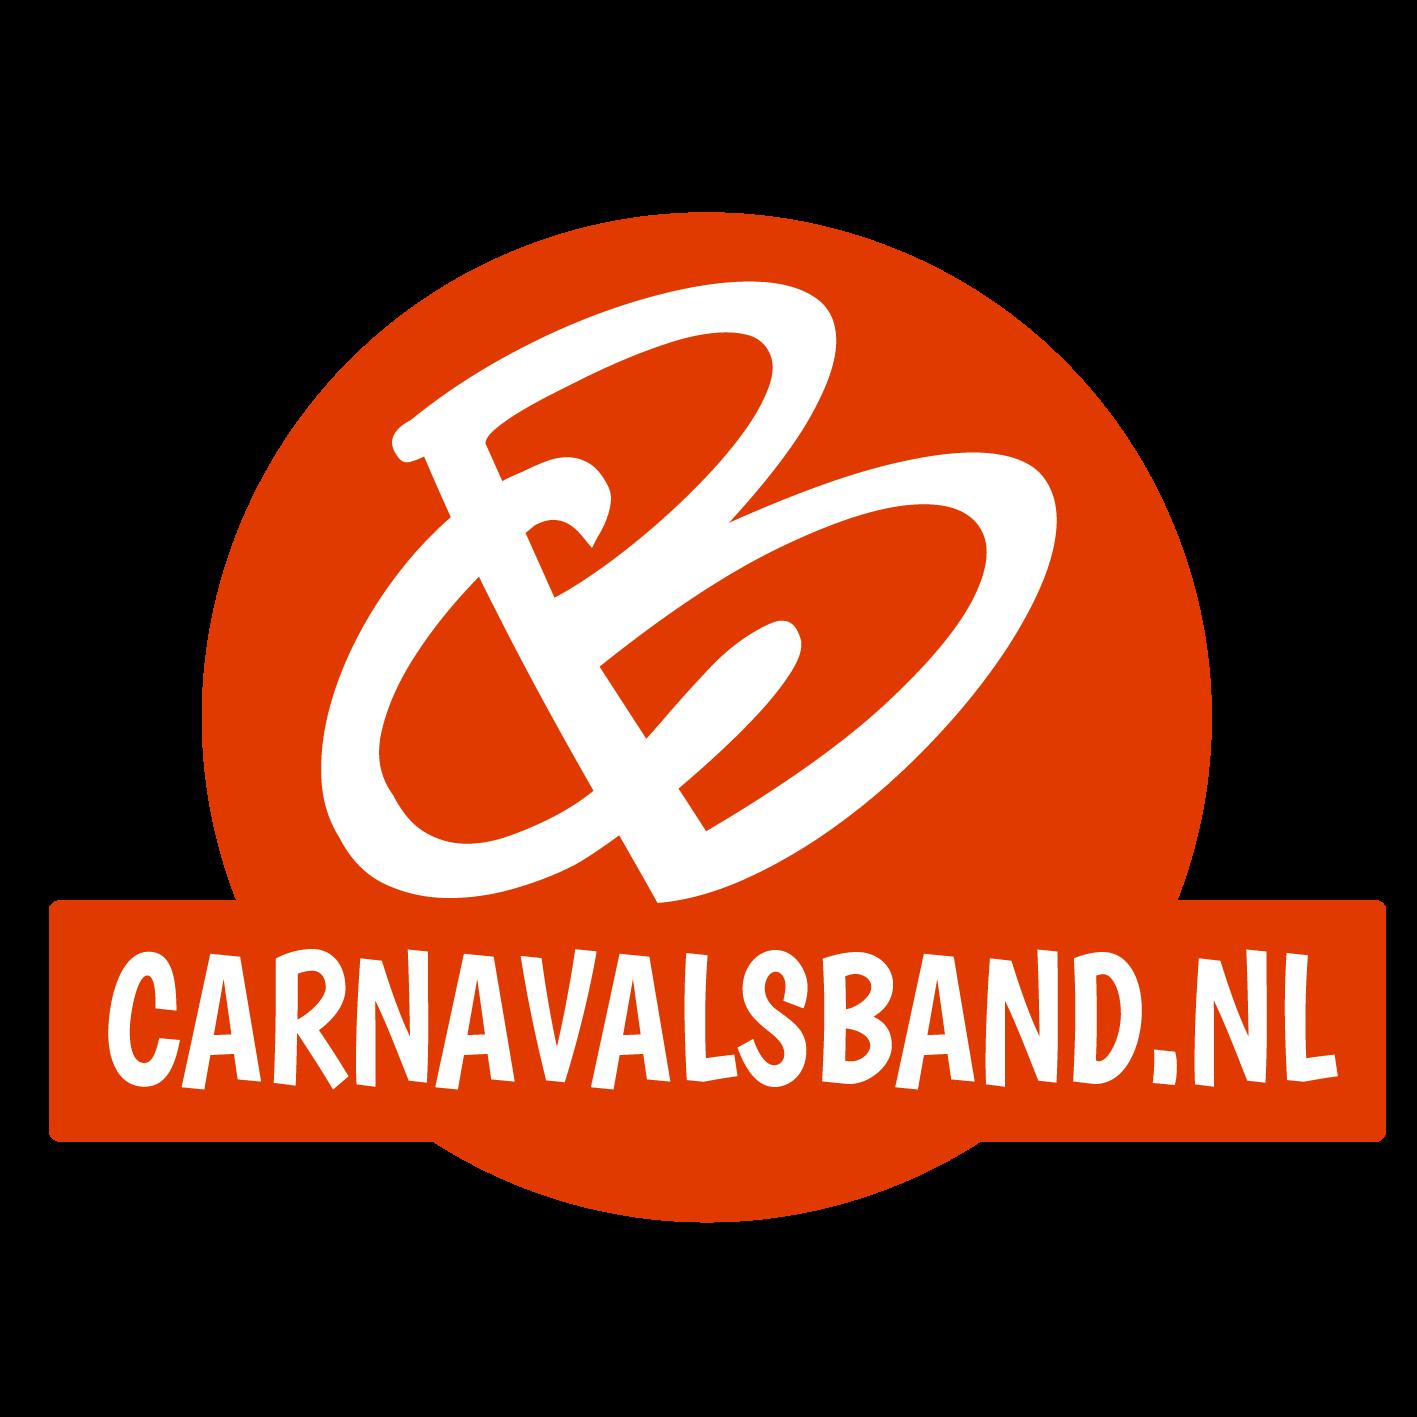 Carnavalsband.nl - Dé carnavalsband van Limburg